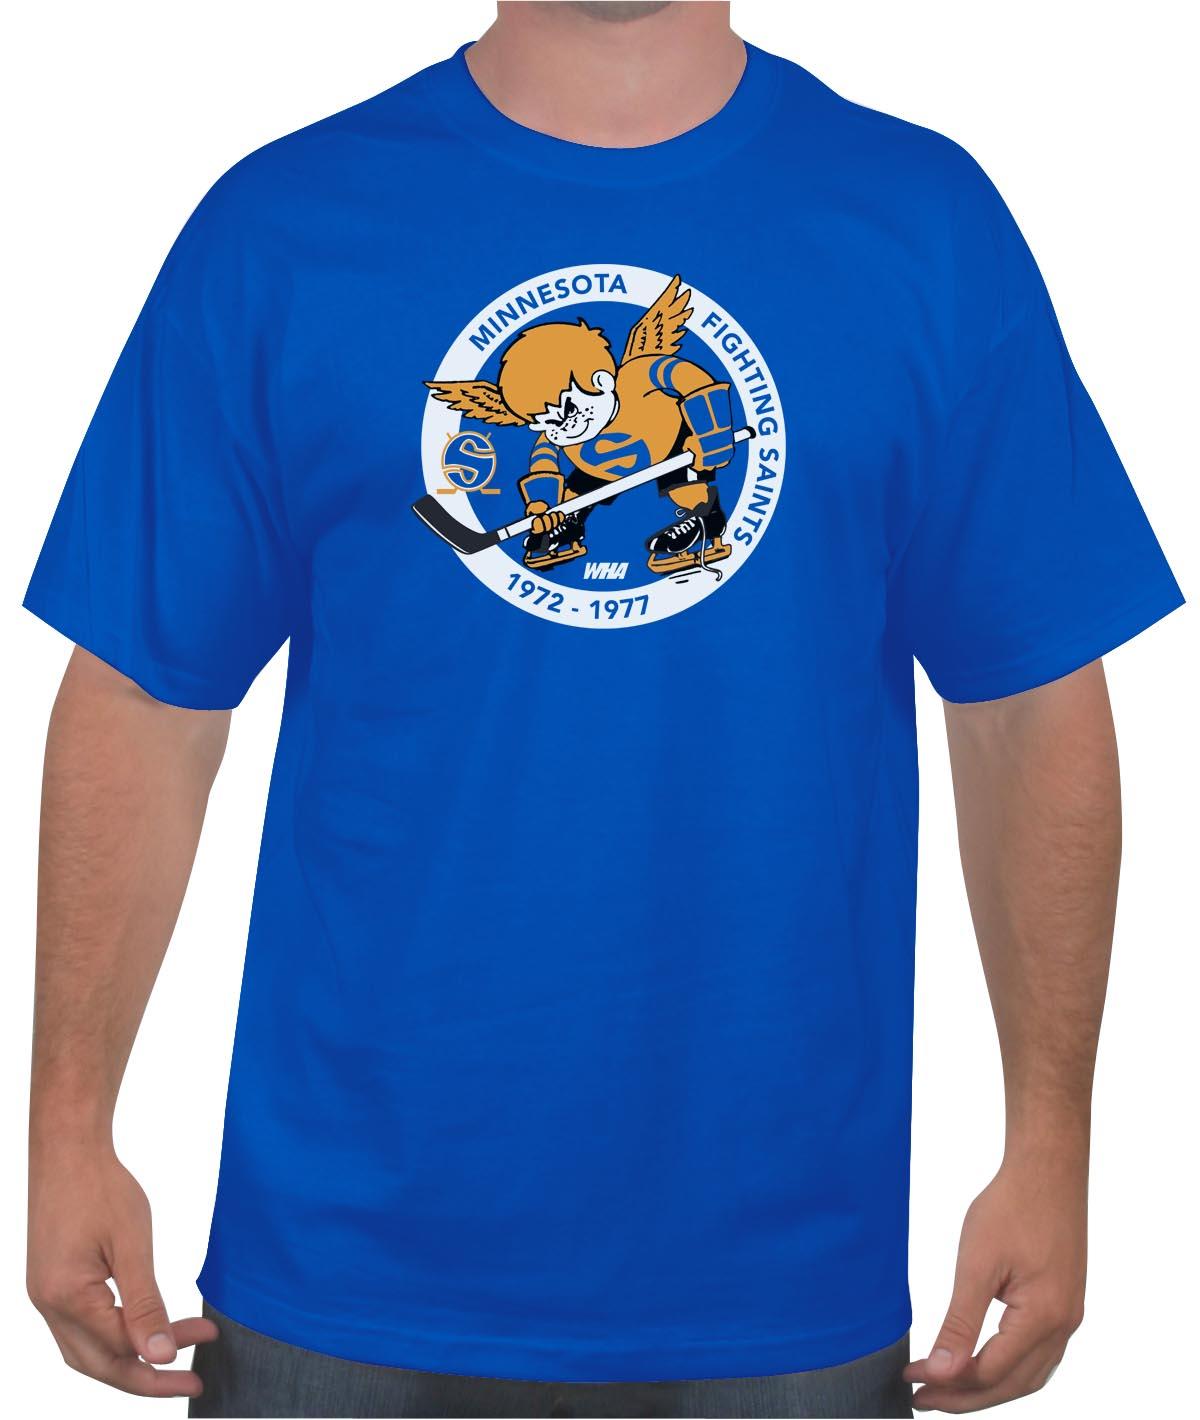 f8c736d42 Buy the Minnesota Fighting Saints Hockey T-Shirt Online : WHA 1972 ...